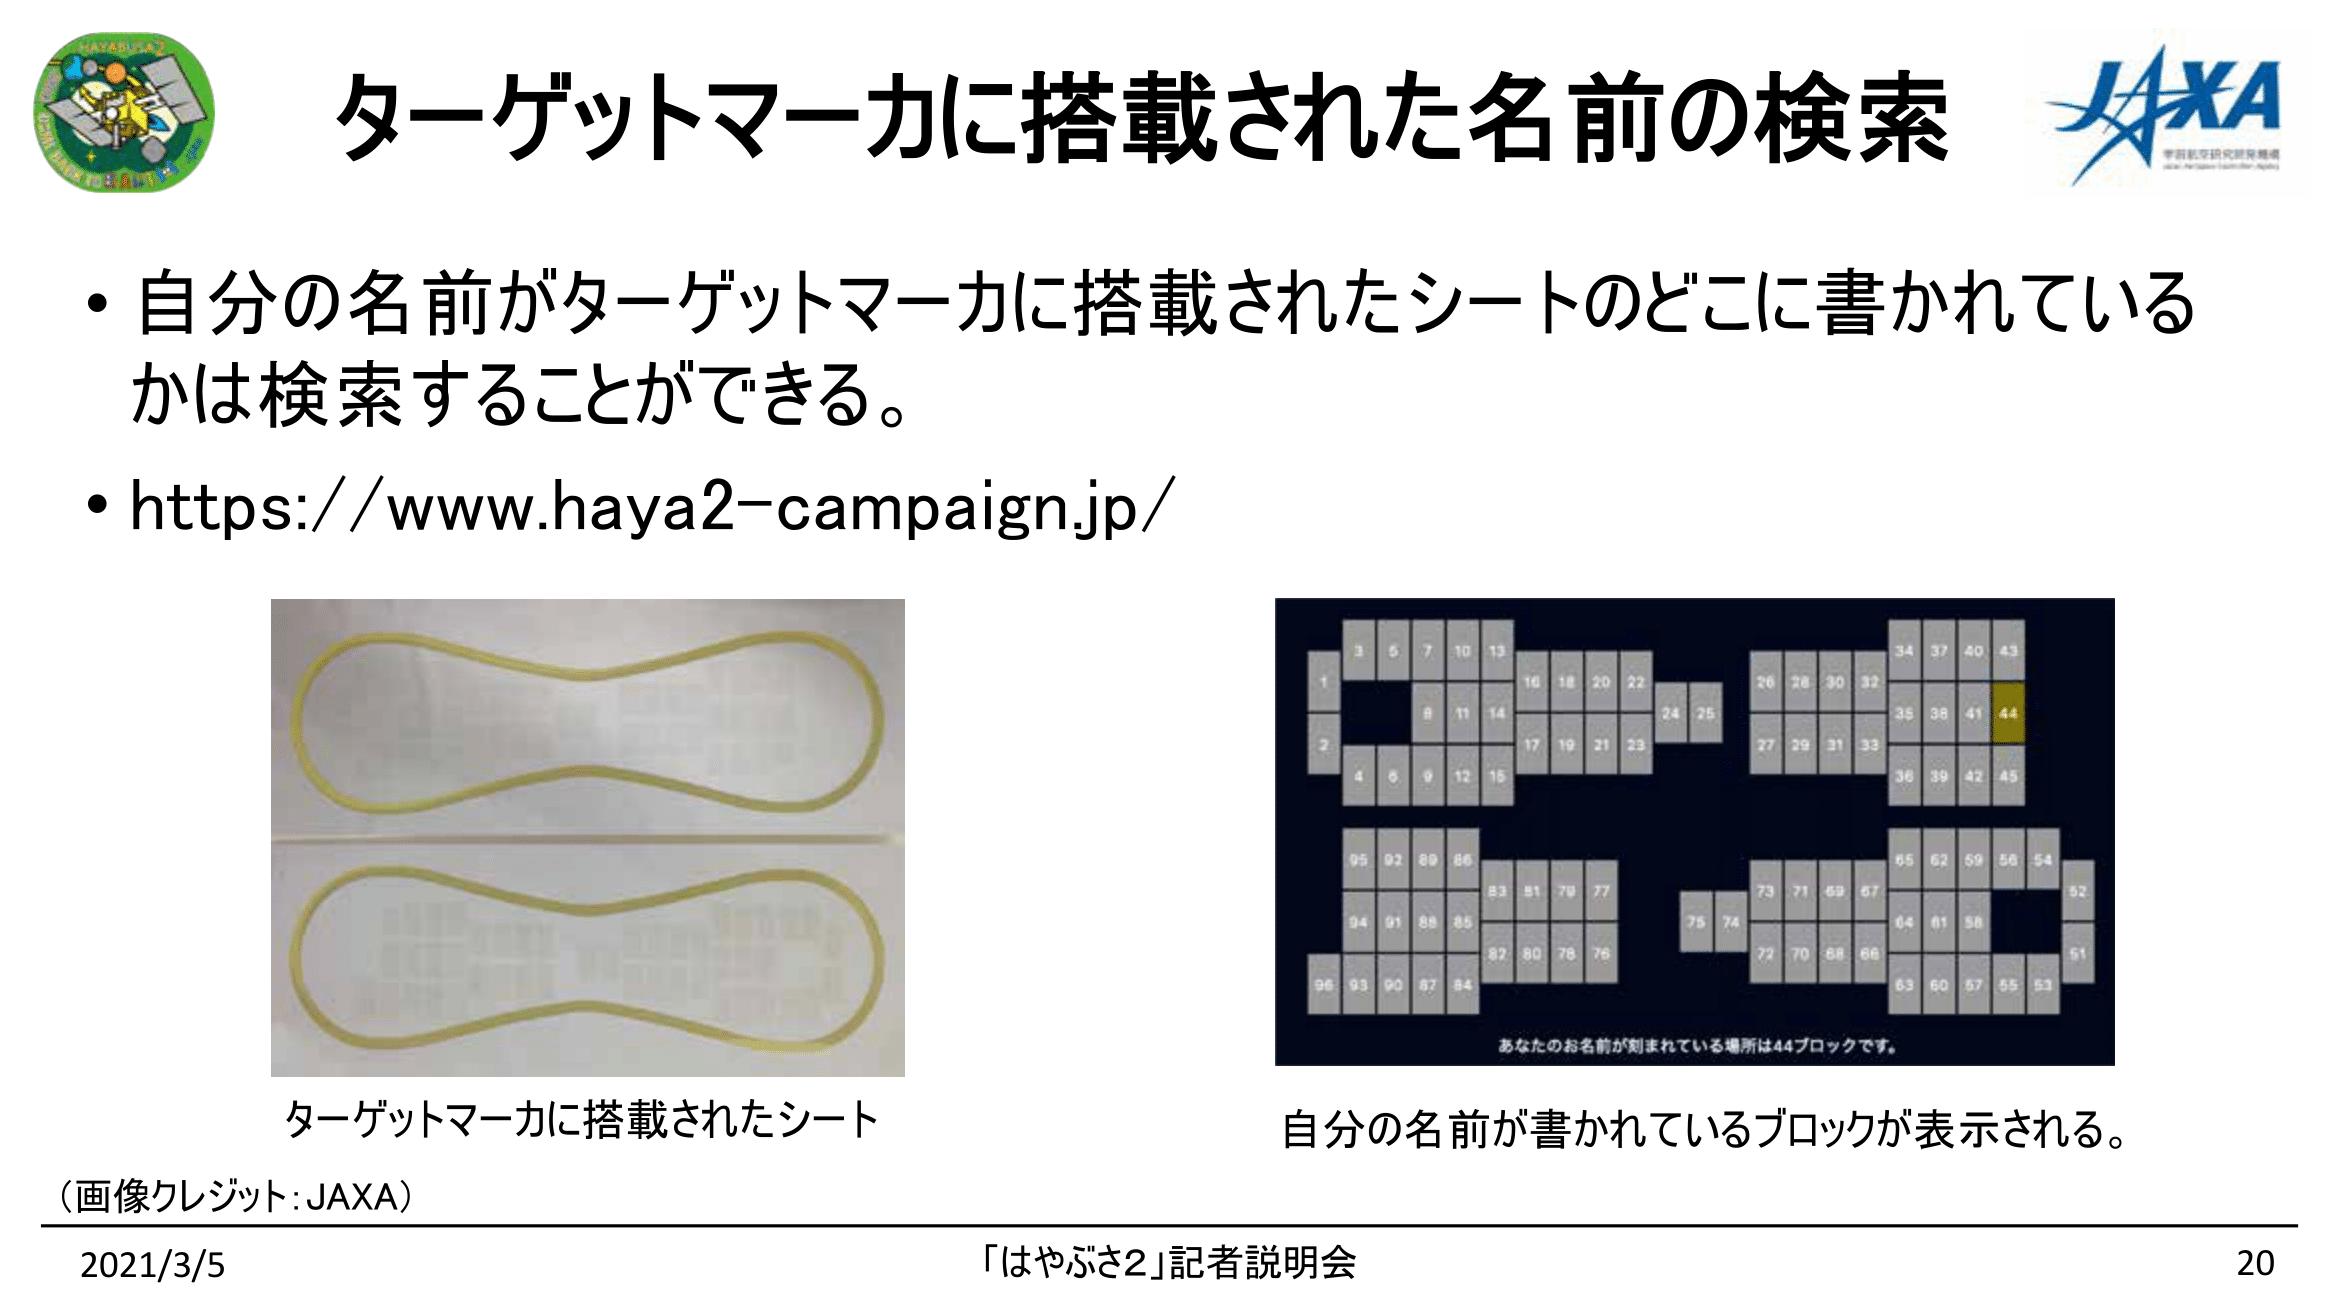 f:id:Imamura:20210305134334p:plain